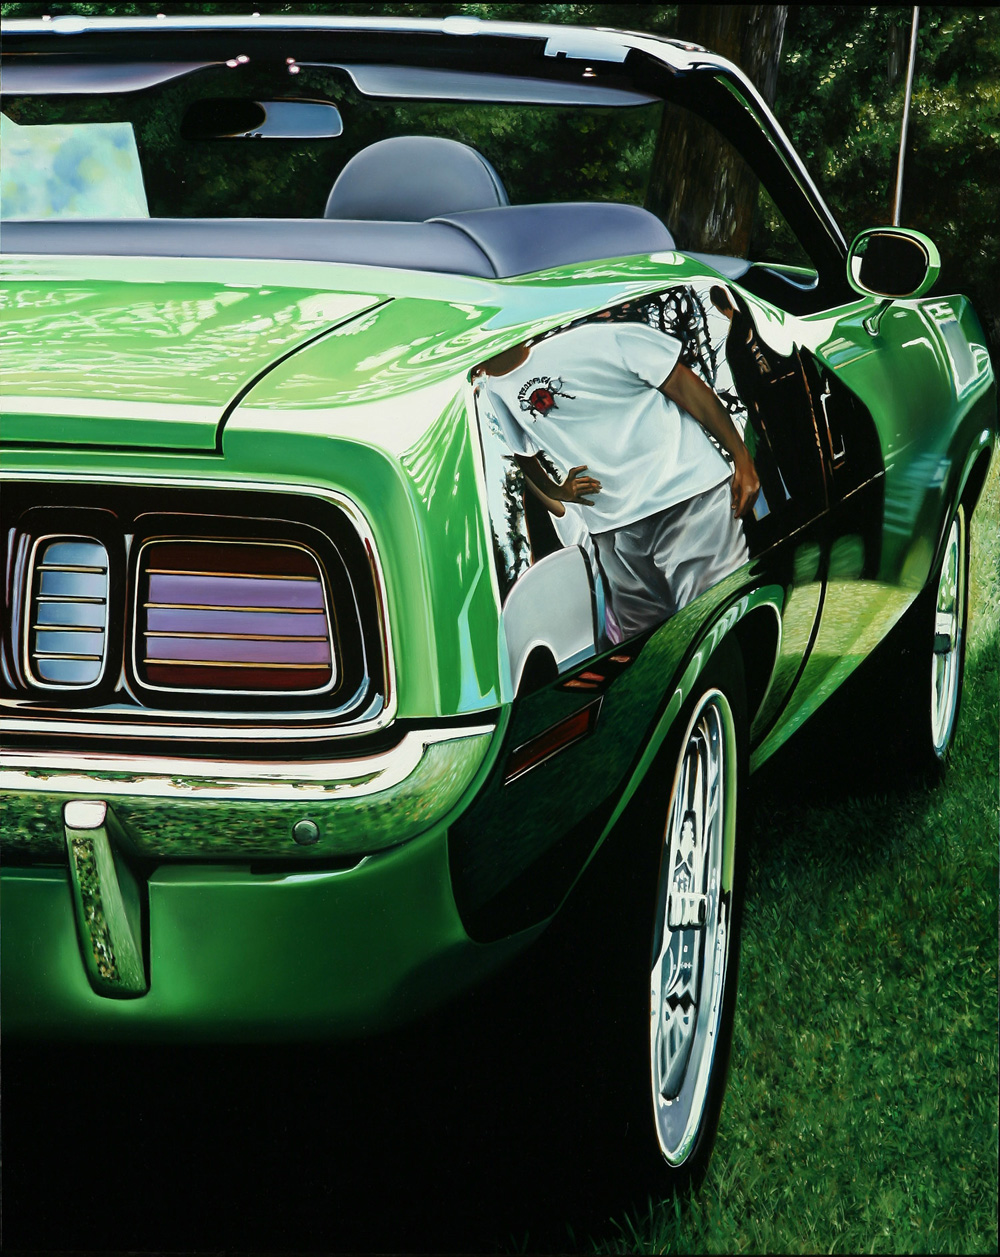 Classic muscle cars paintings by Cheryl Kelley 5 Green HemiCuda